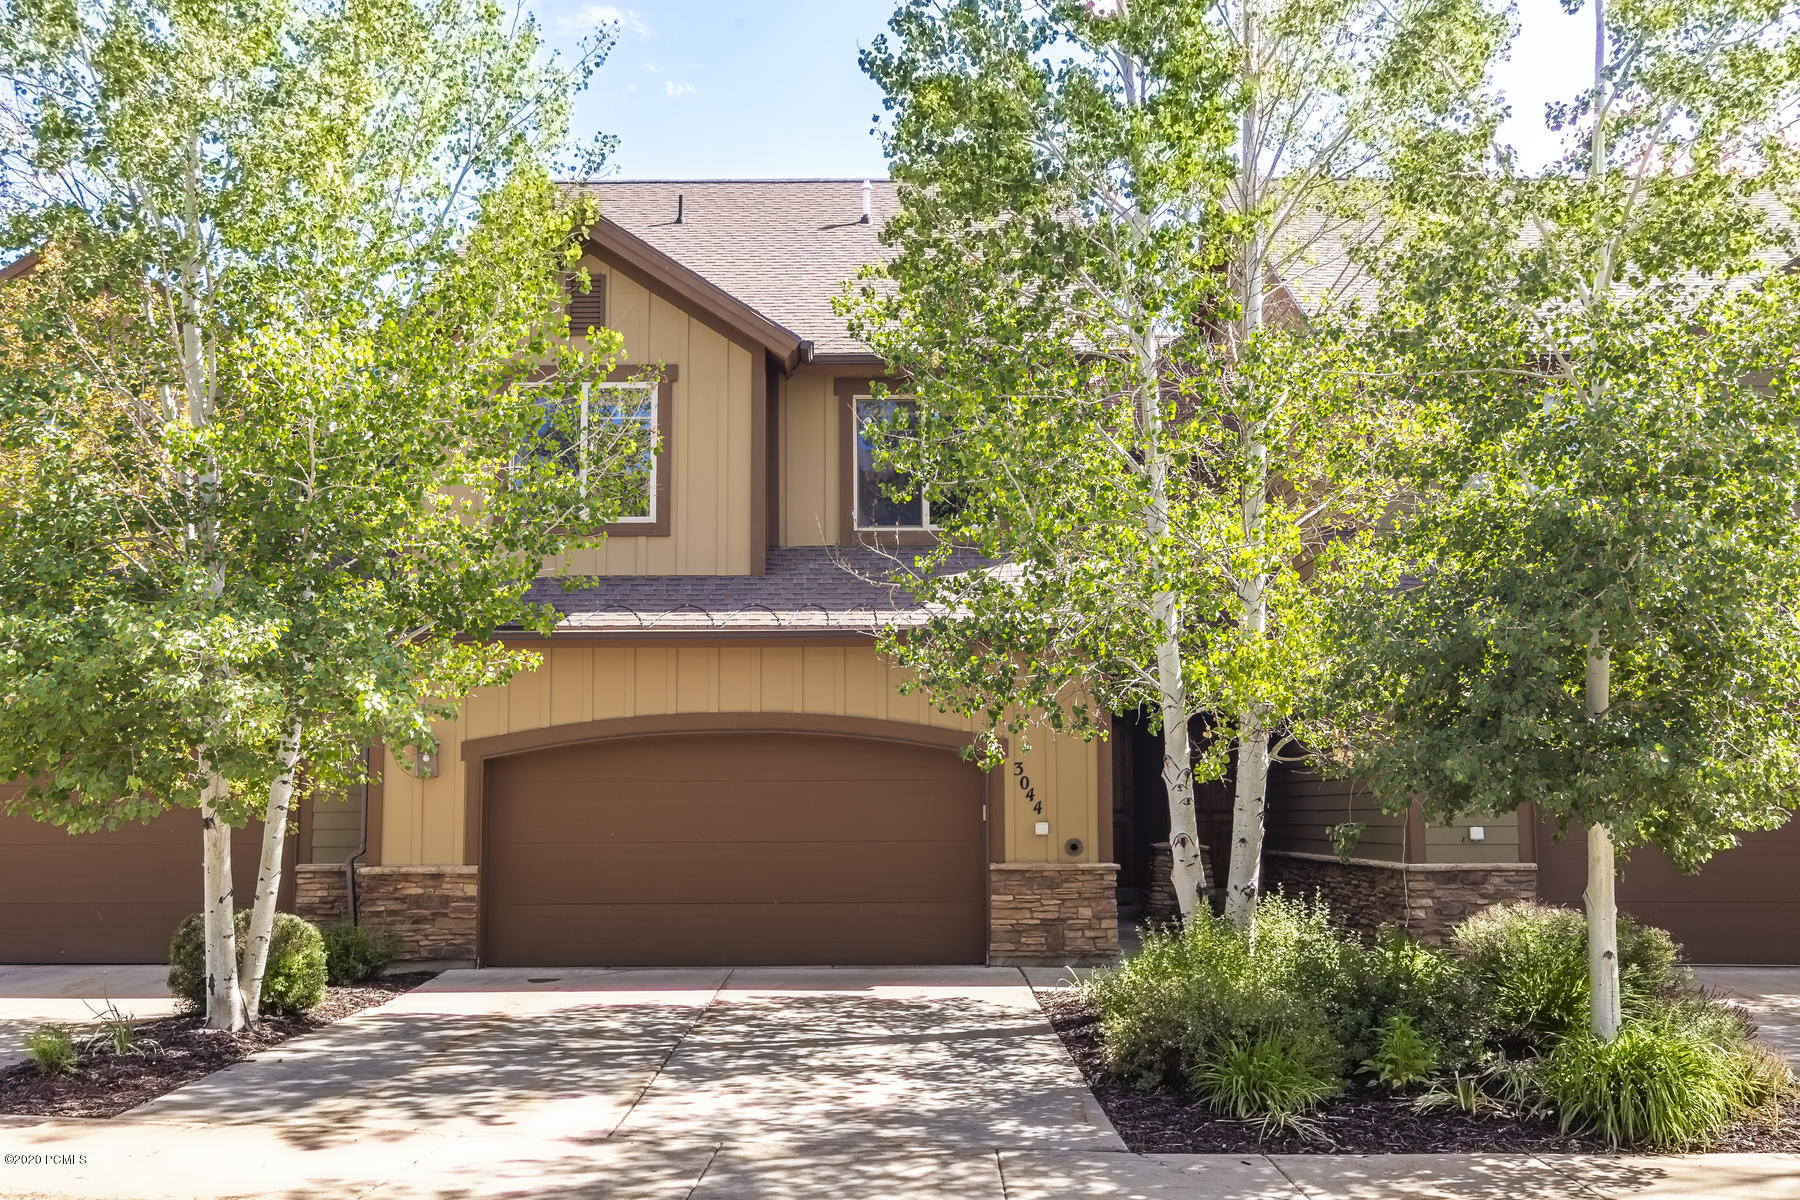 3044 Lower Saddleback Road, Park City, Utah 84098, 4 Bedrooms Bedrooms, ,4 BathroomsBathrooms,Condominium,For Sale,Lower Saddleback,20190109112430415765000000